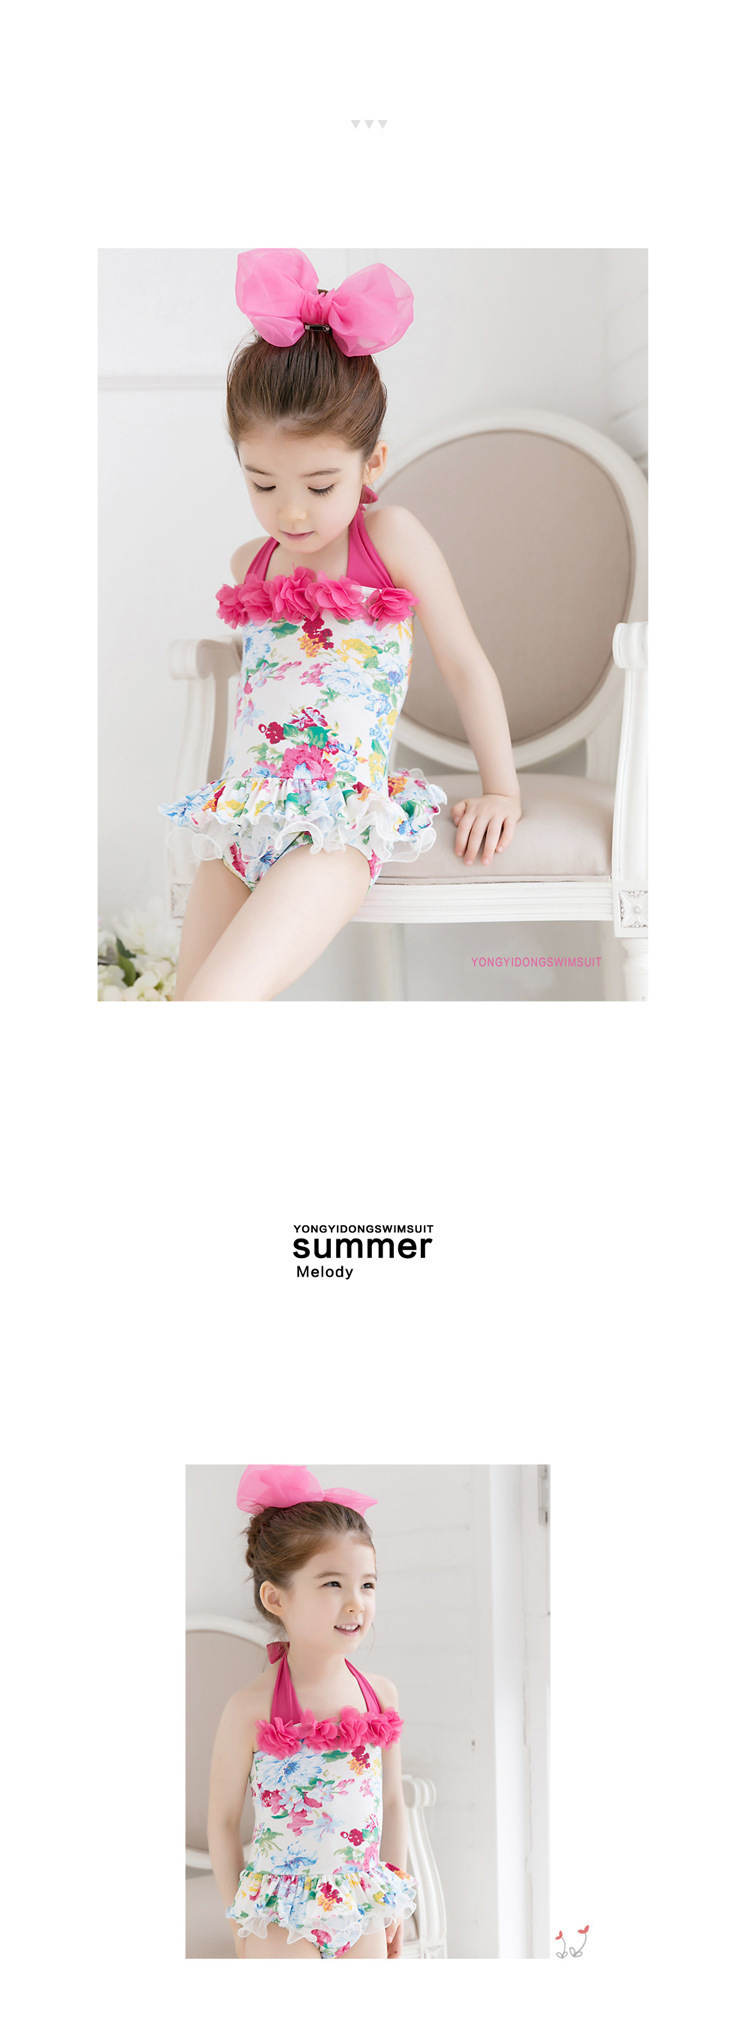 2pcs Baby Girls Swimwear Kids Swimming Bikinis Siamese skirt type swimsuit one piece lace sweet Bathing Suit Swimsuit with Cap (14)